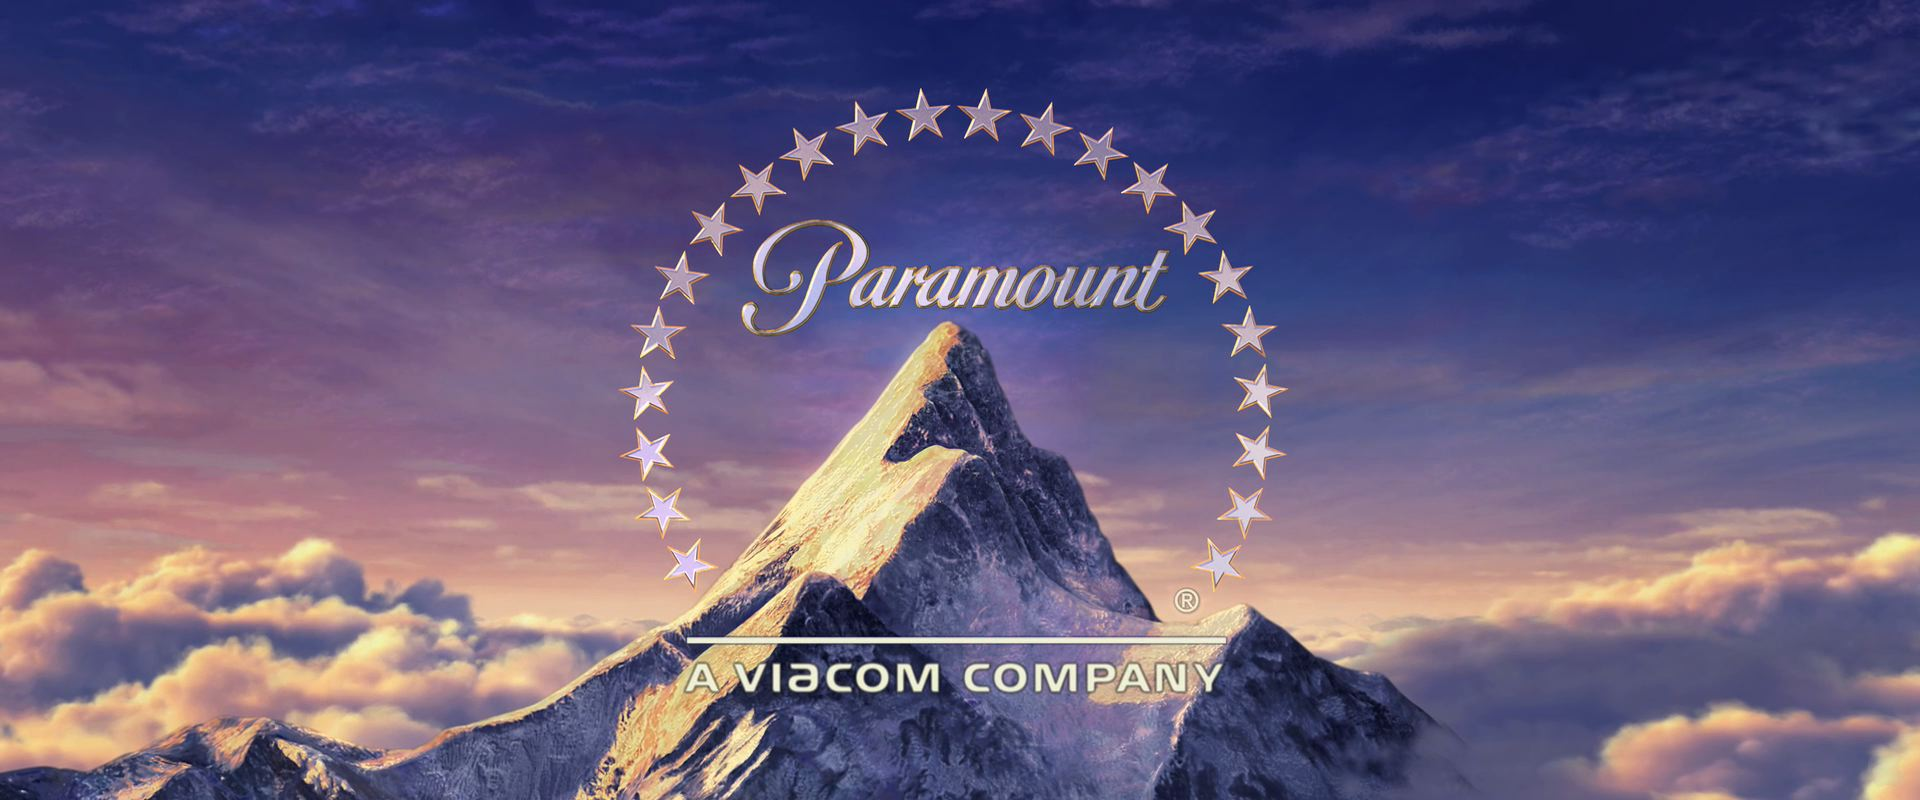 paramountstudios